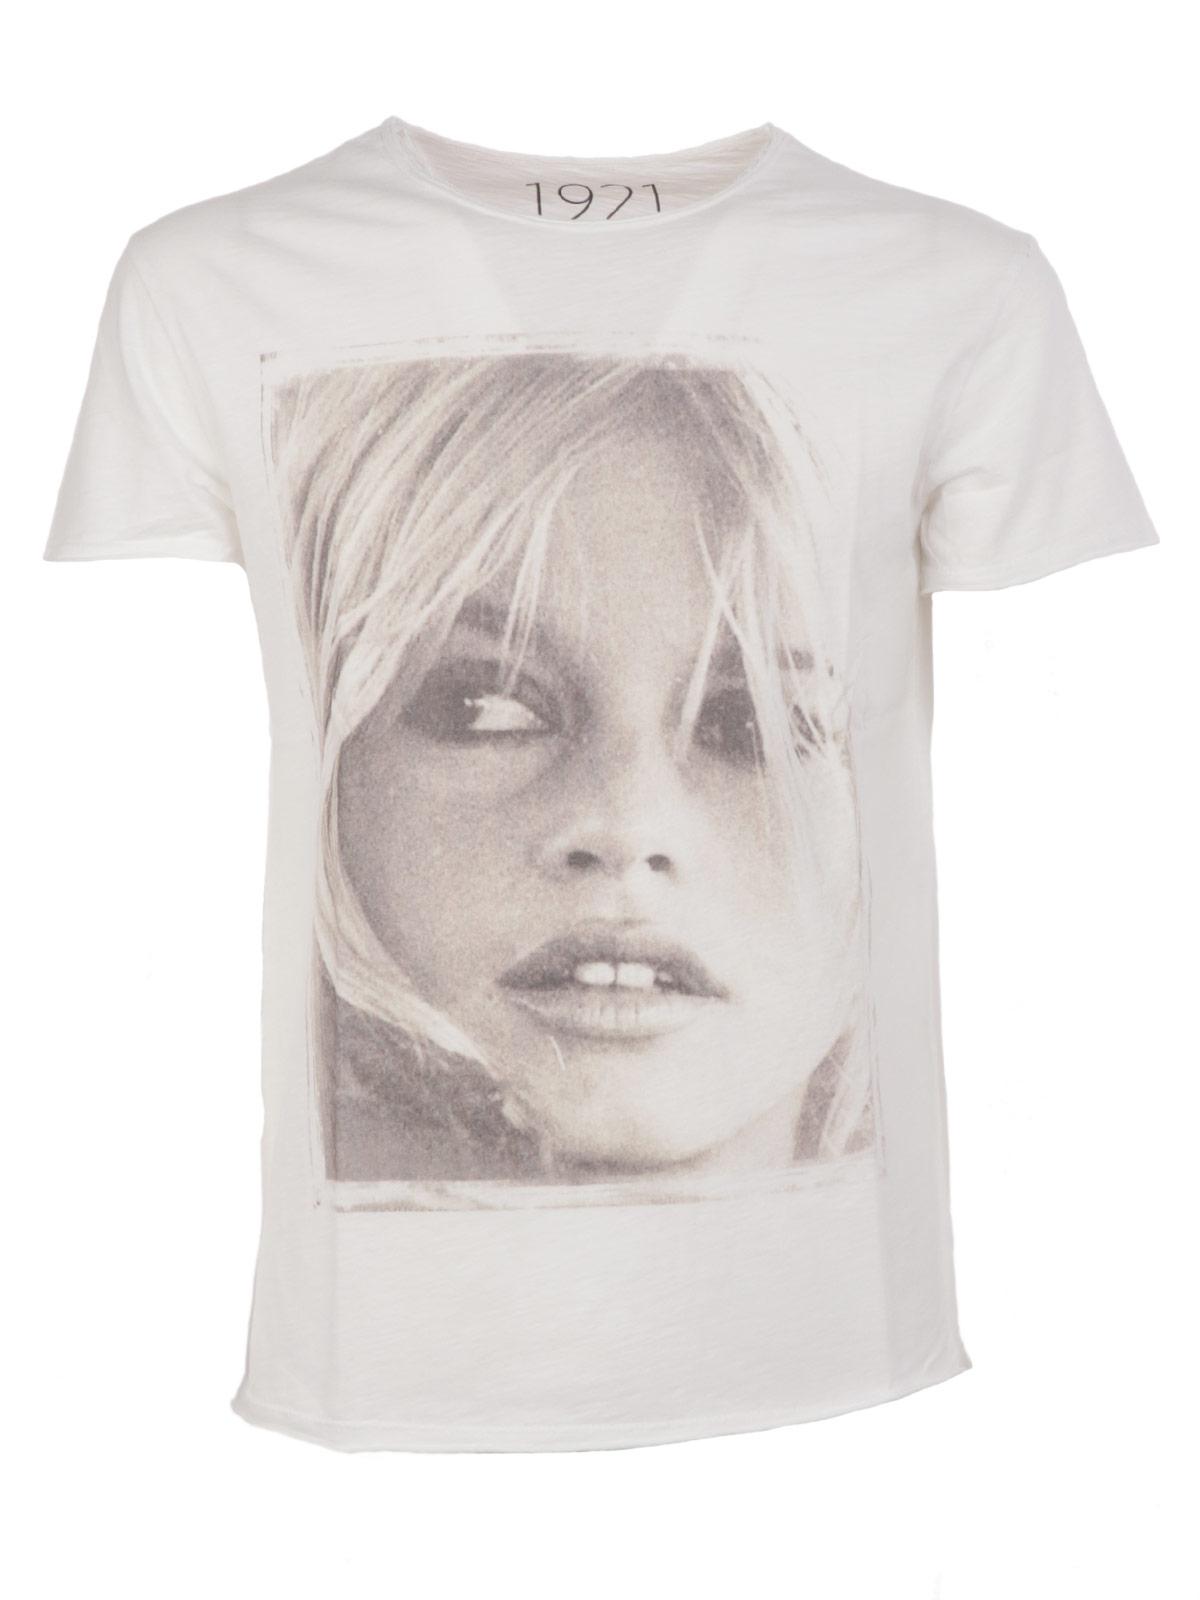 Immagine di 1921 | T-Shirt Uomo Brigitte Bardot